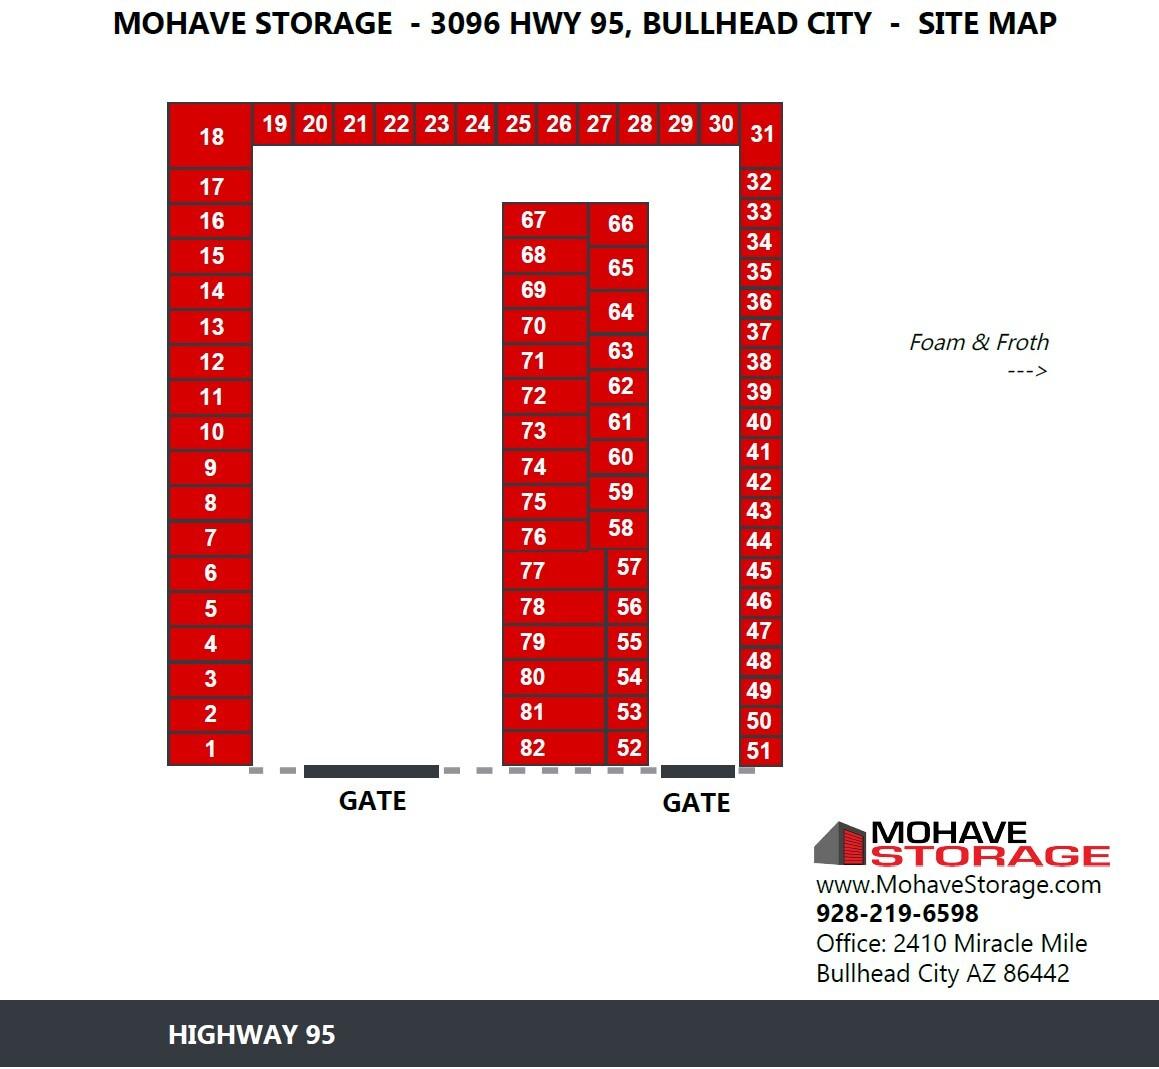 Site Map 3096 Hwy 95 Bullhead Prospective Tenants Mohave Storage